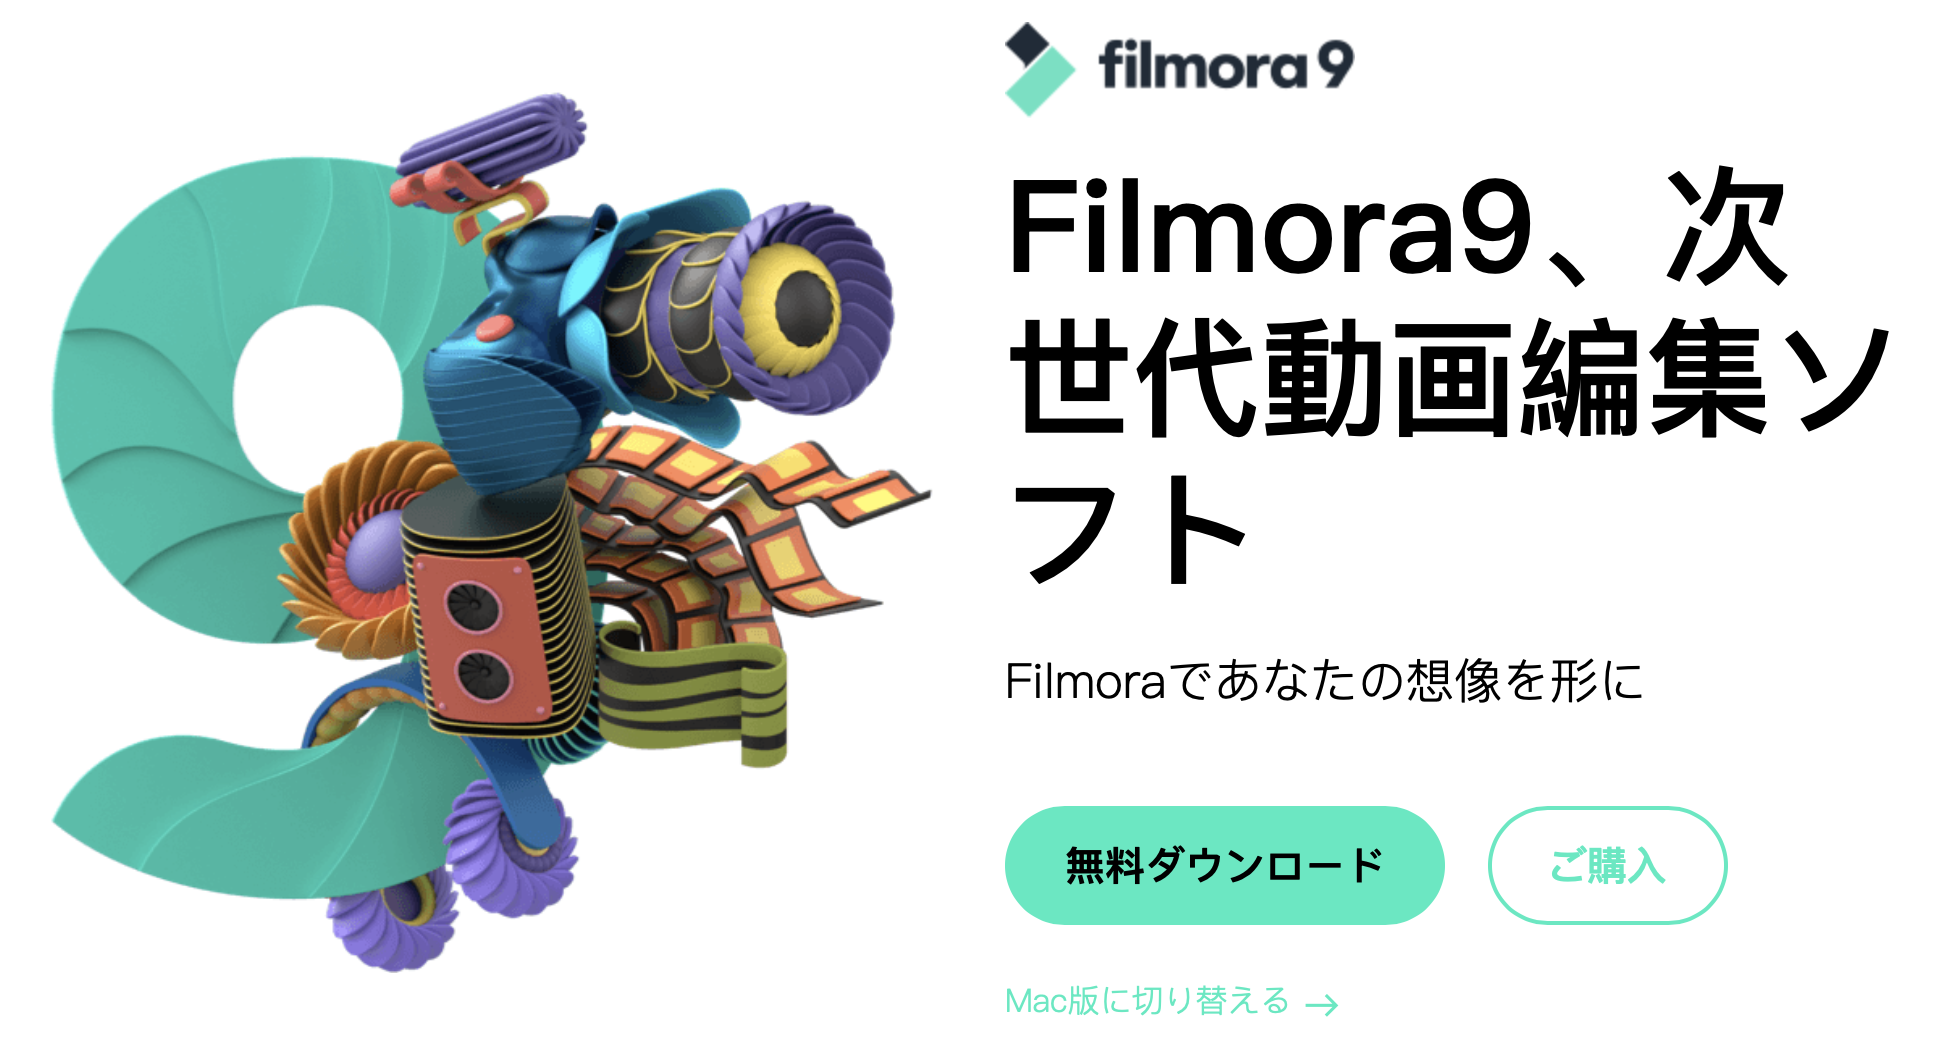 filmora9とは